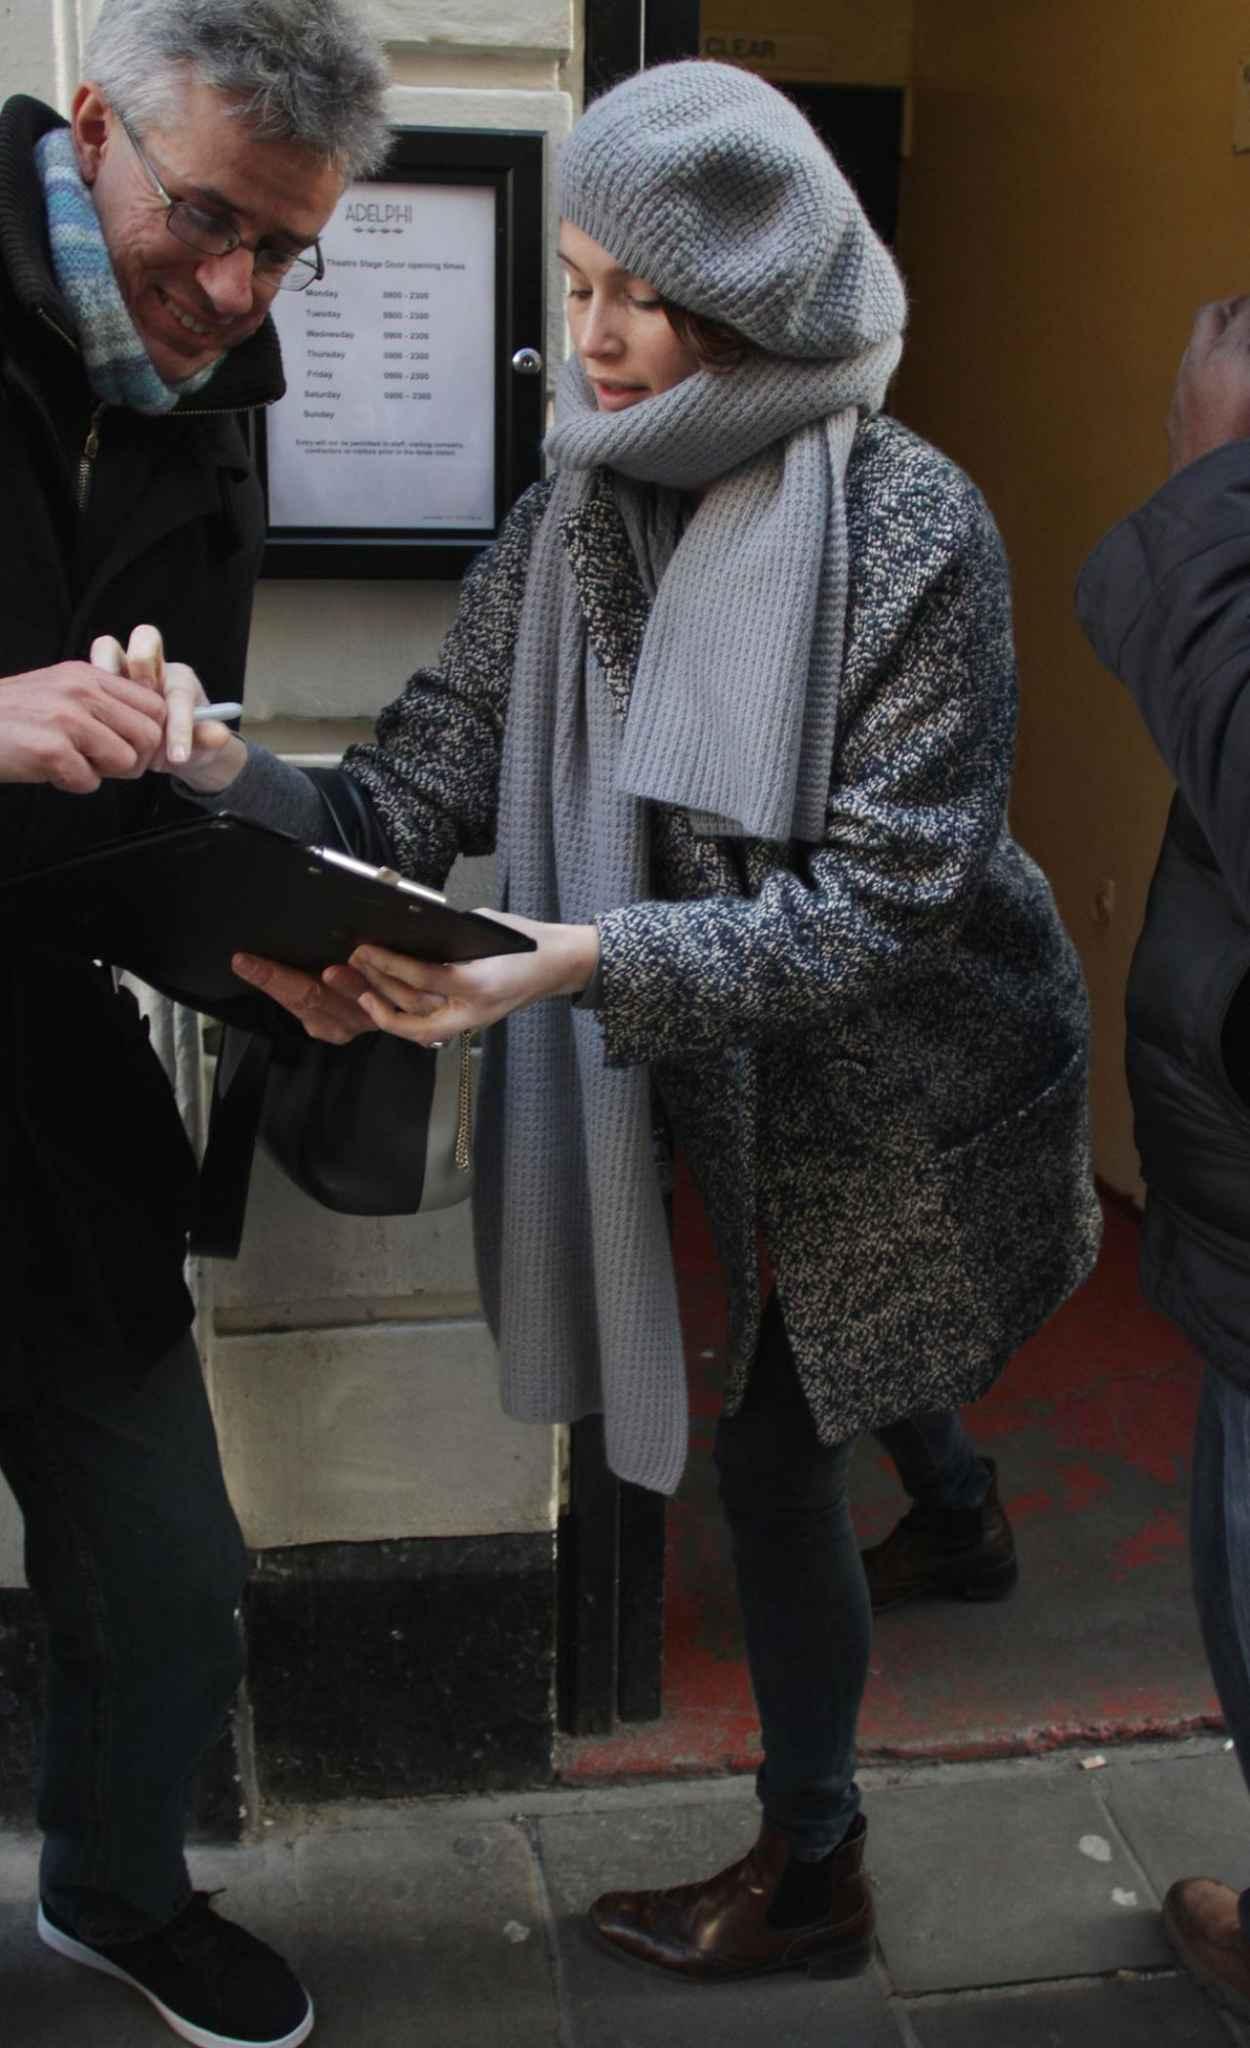 Gemma Arterton Signing Autographs - Adelphi Theatre in London, Dec. 2015-1